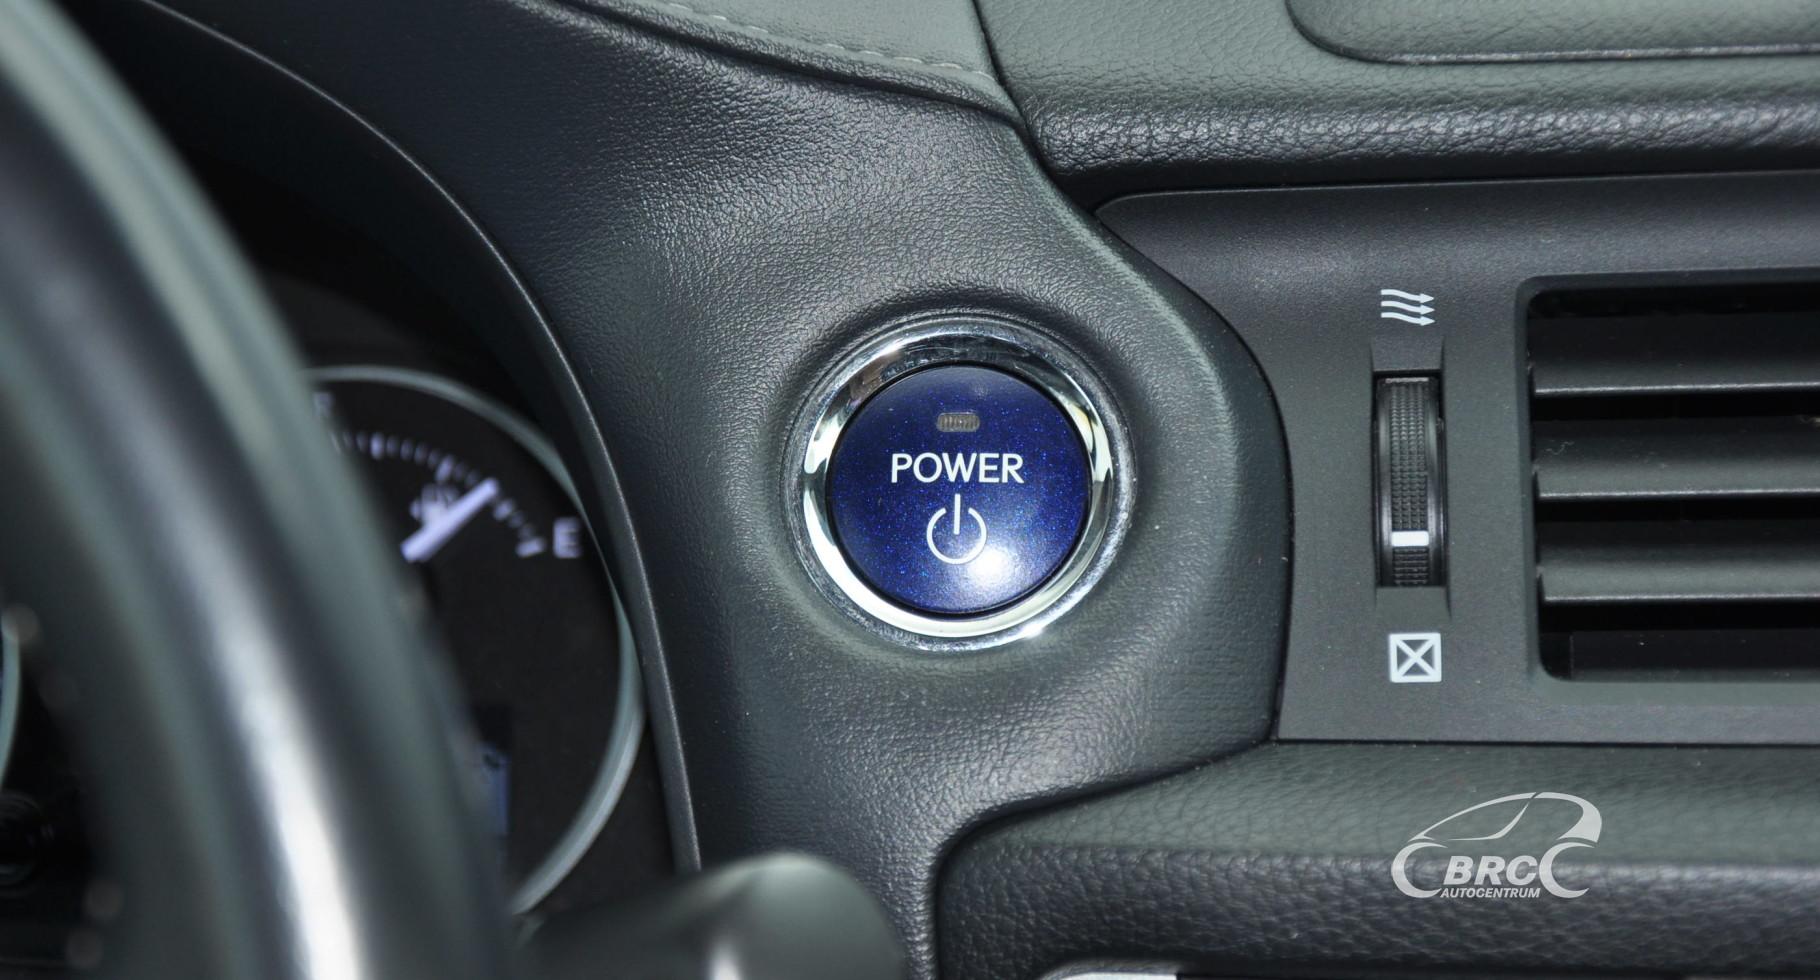 Lexus CT 200H 1.8 Hybrid Automatas